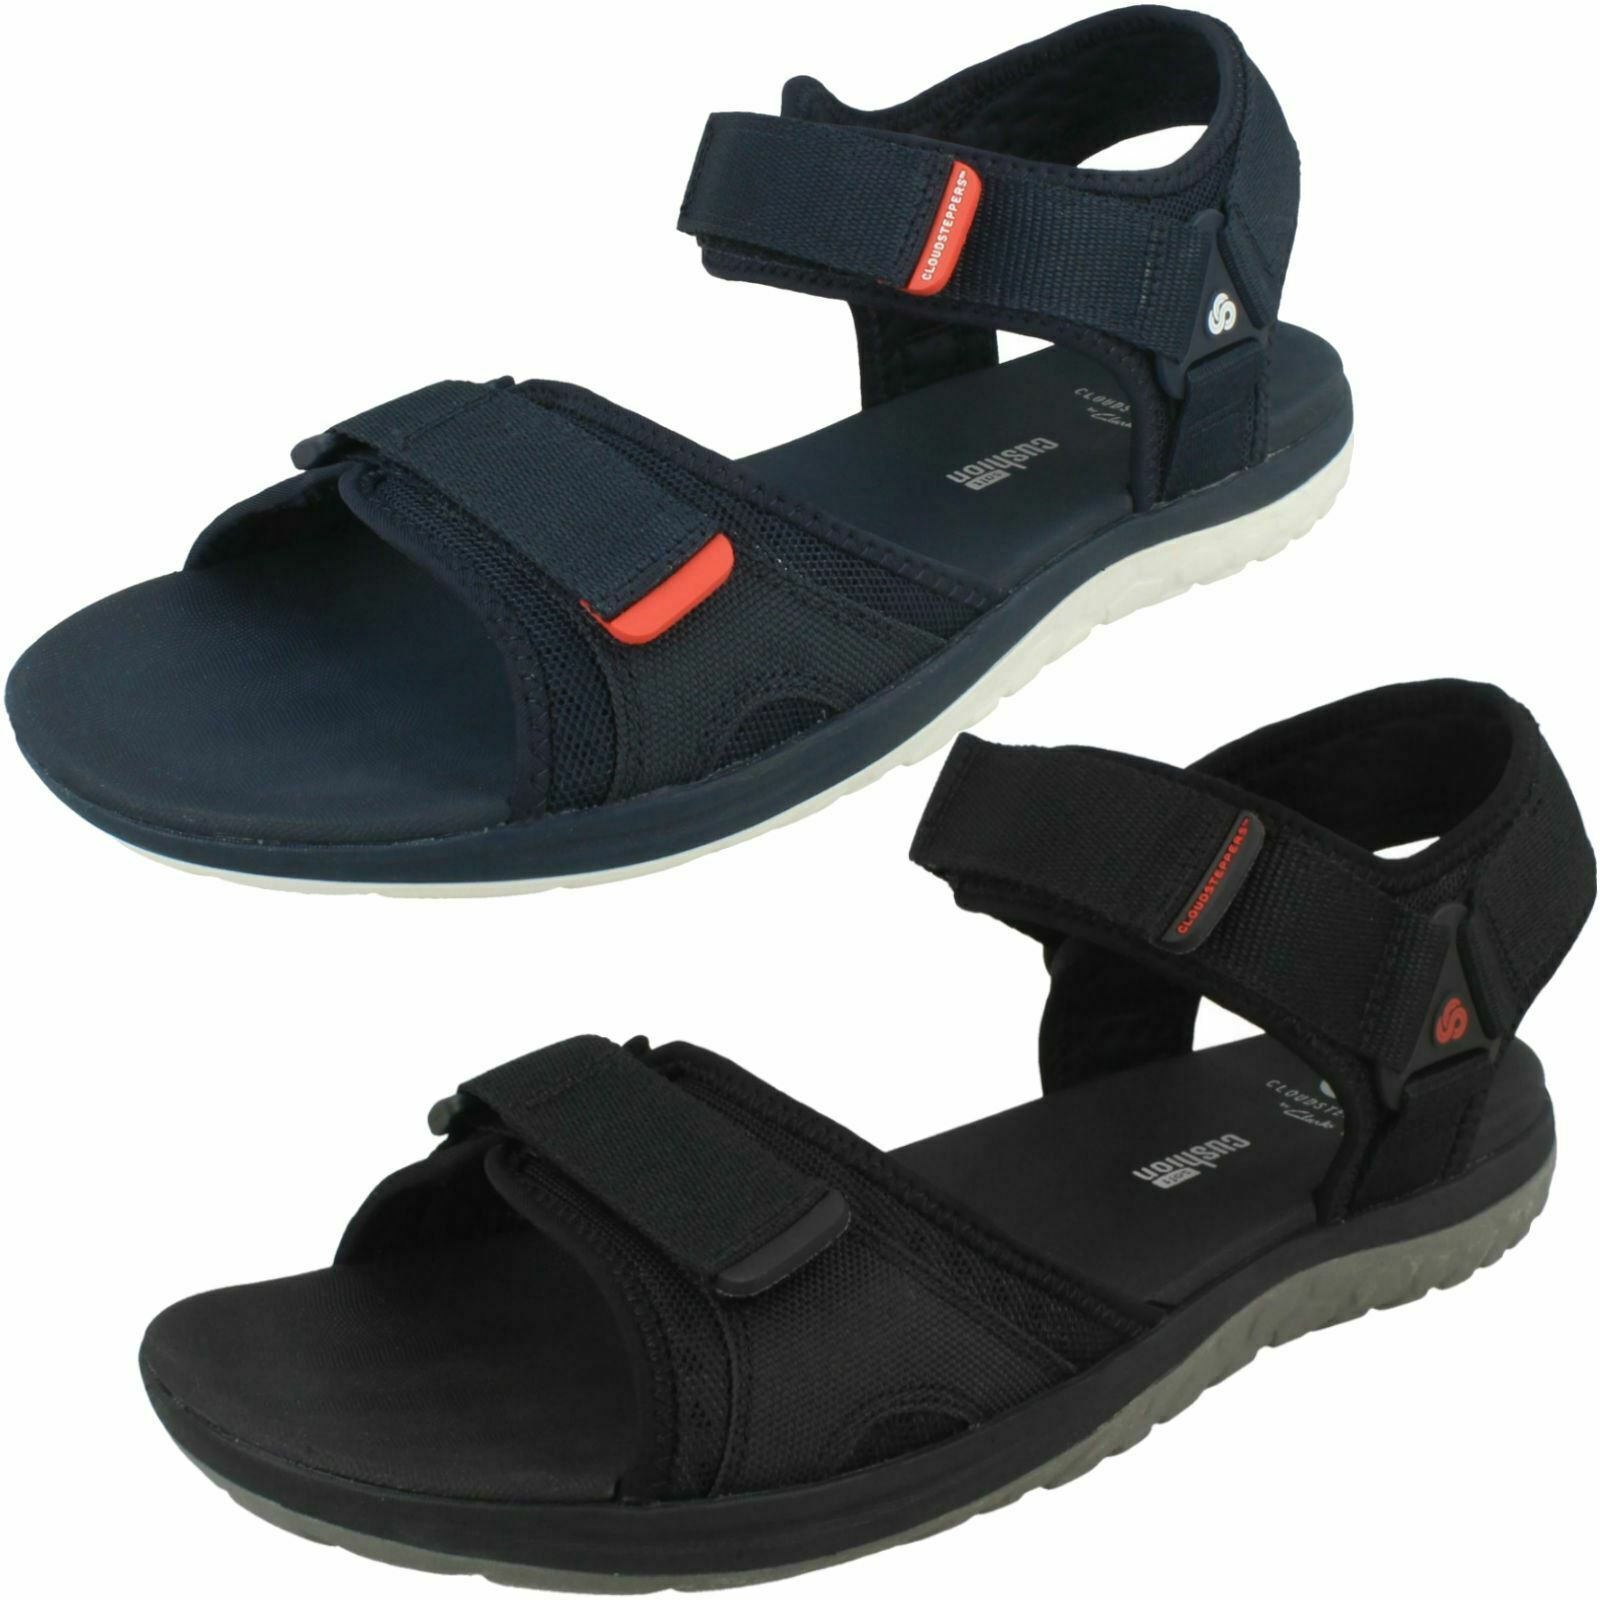 Mens Clarks Cloudsteppers Sandals 'Step Beat Sun'